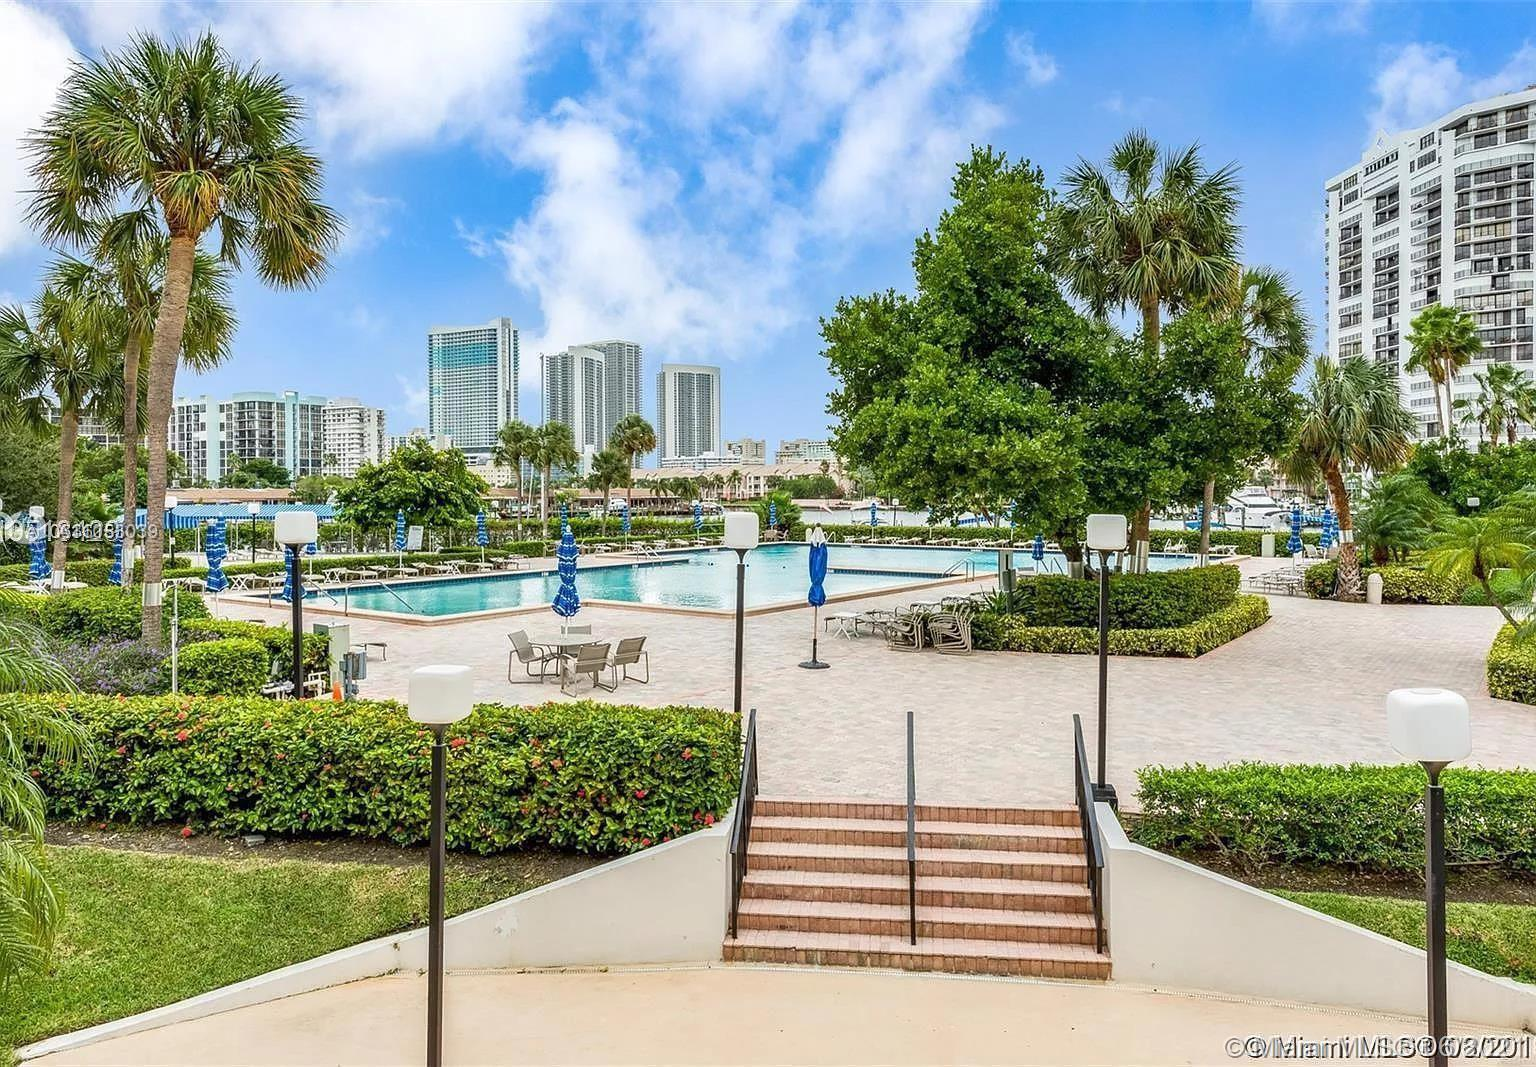 Photo of 600 Three Islands Blvd #312, Hallandale Beach, Florida, 33009 - OLYMPUS MARINA POOL DECK